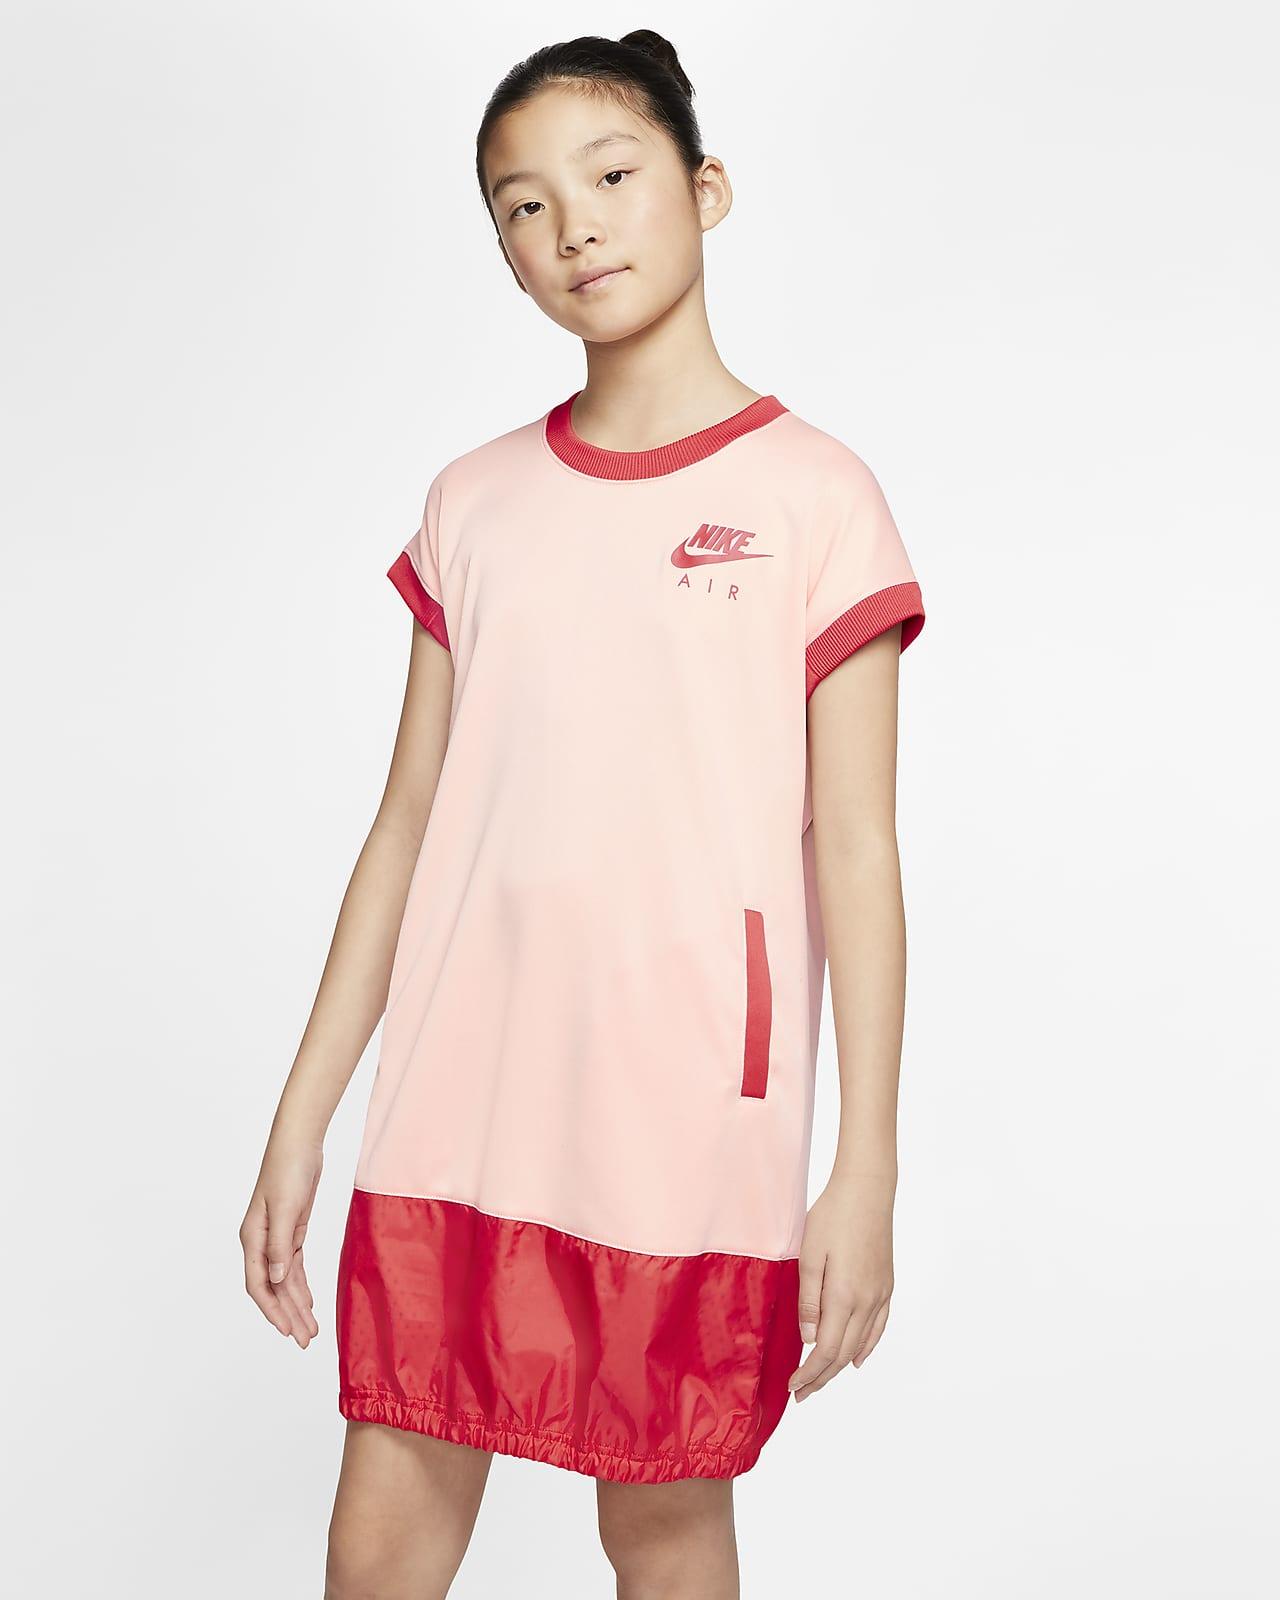 Vestido de manga curta Nike Air Júnior (Rapariga)